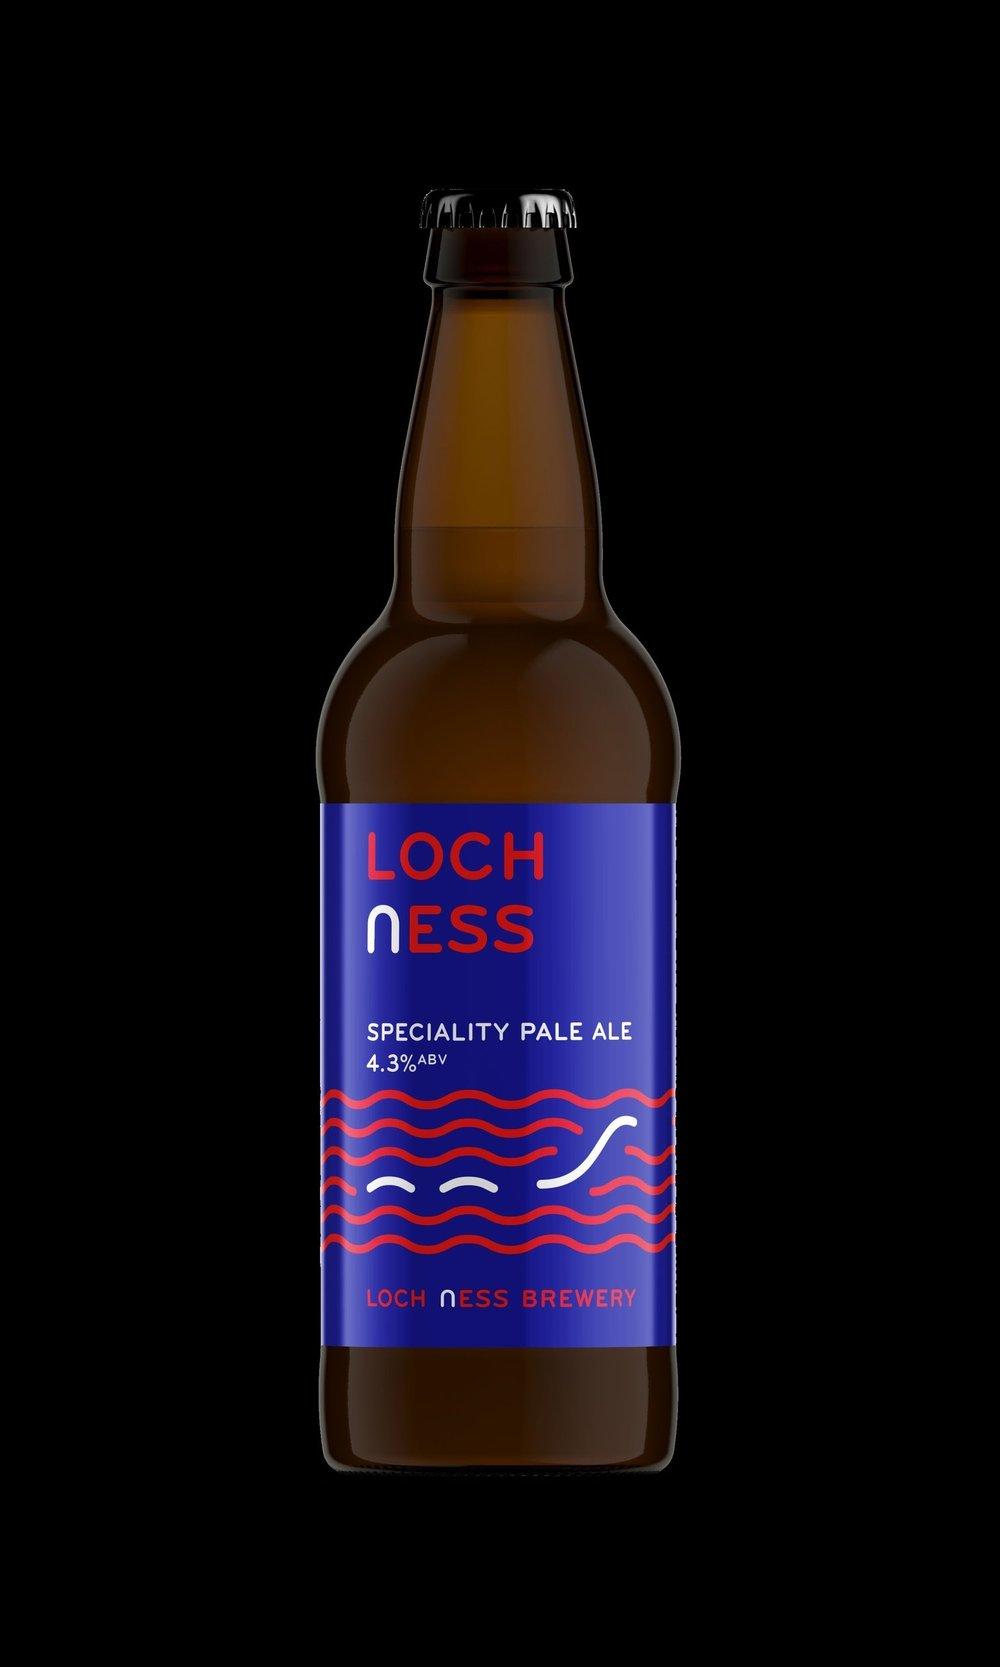 Loch Ness Brewery_LochNess_500ml Bottle _DARK_BGRD.jpg